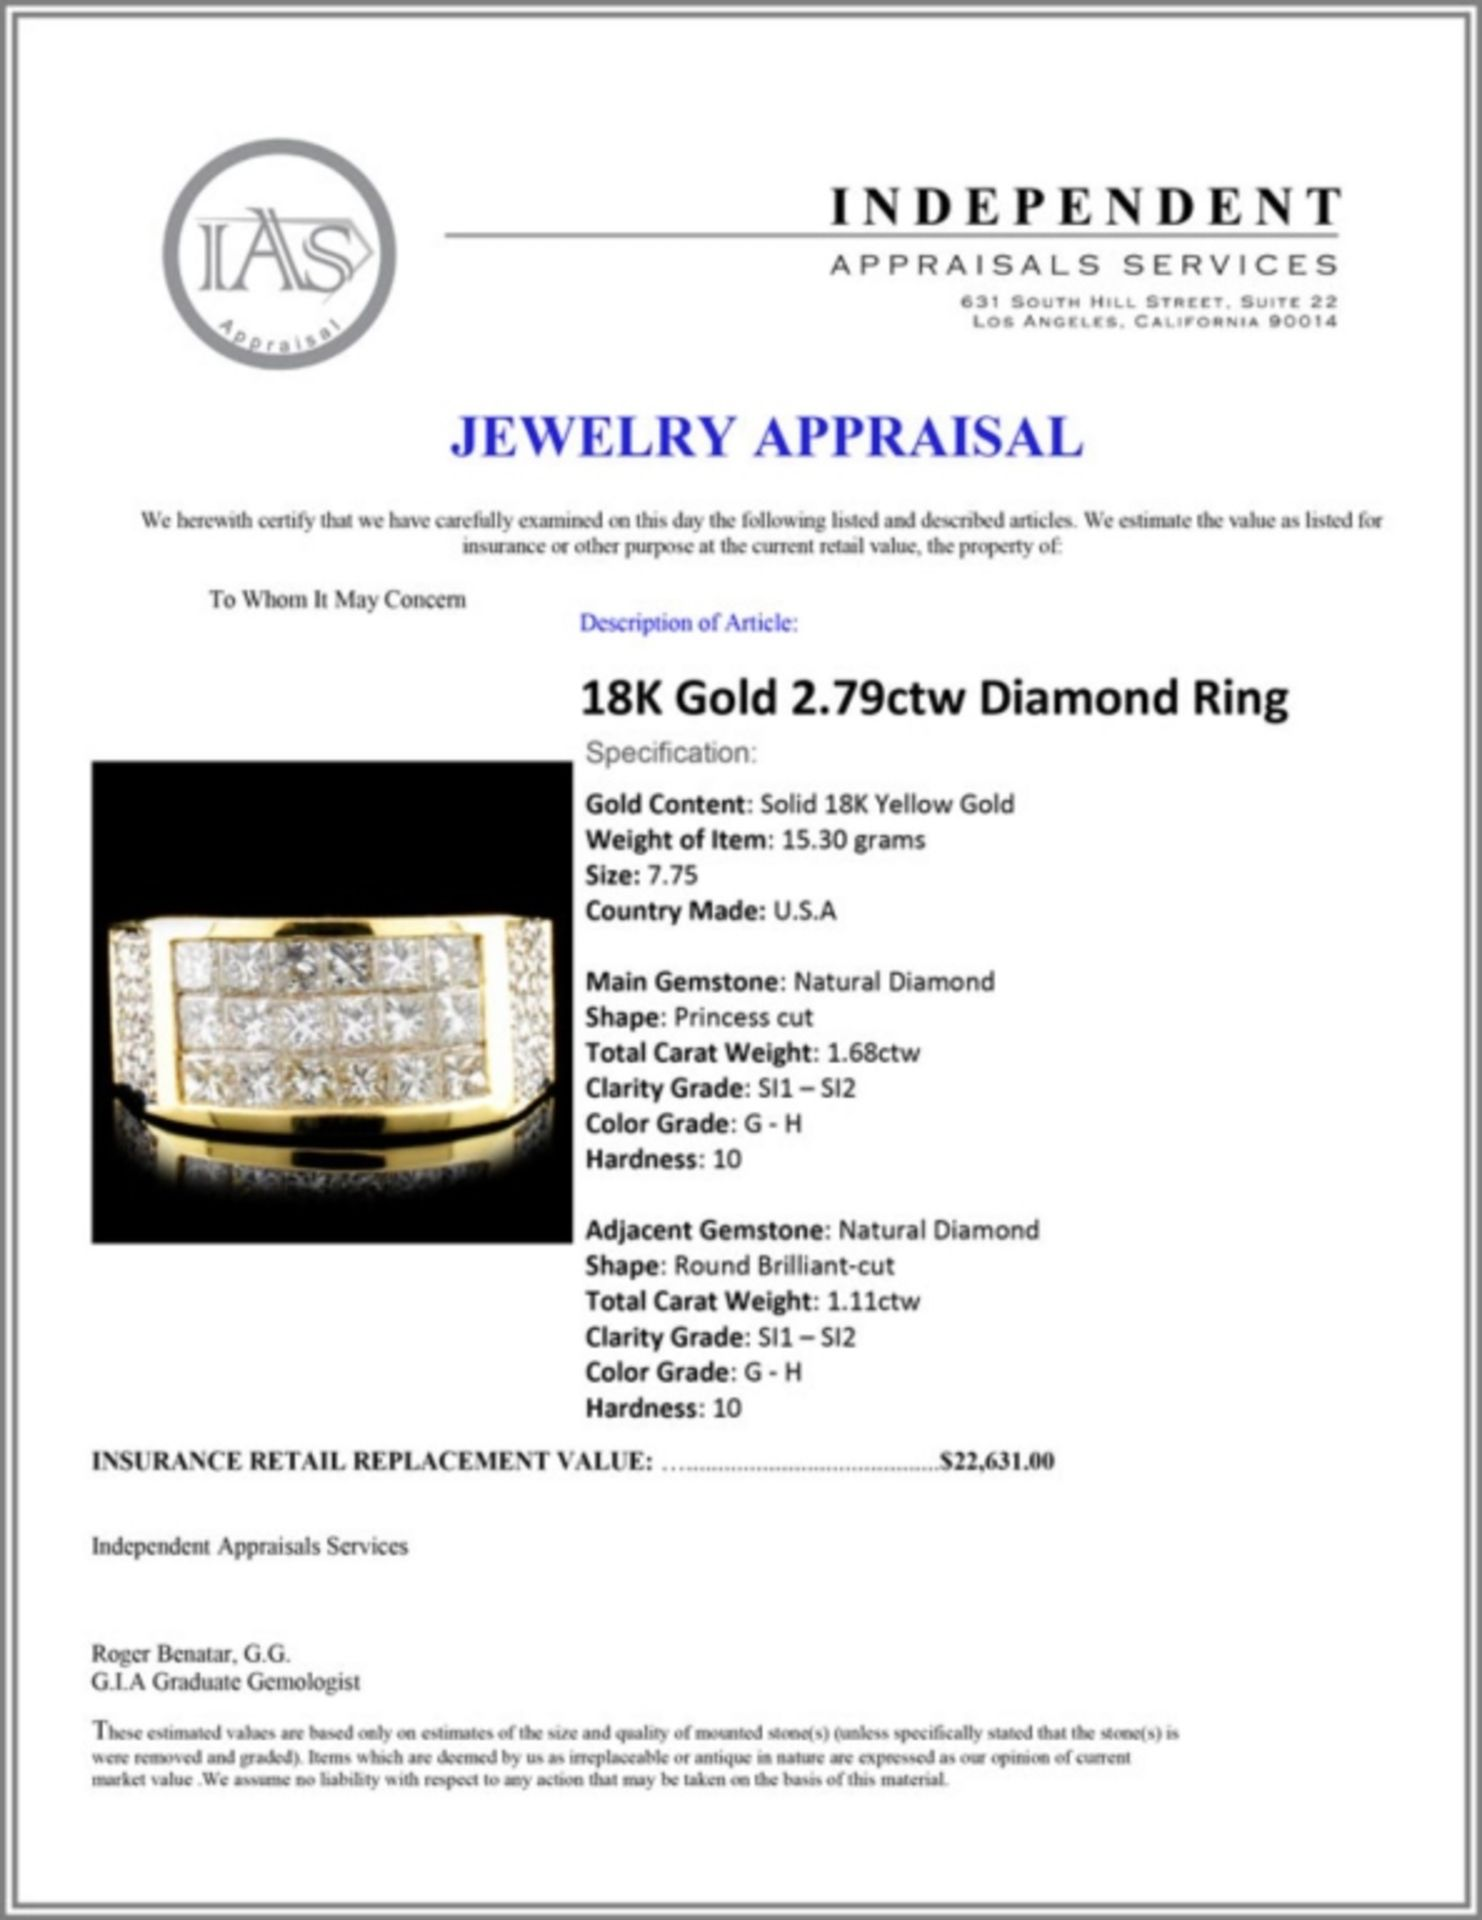 18K Gold 2.79ctw Diamond Ring - Image 5 of 5